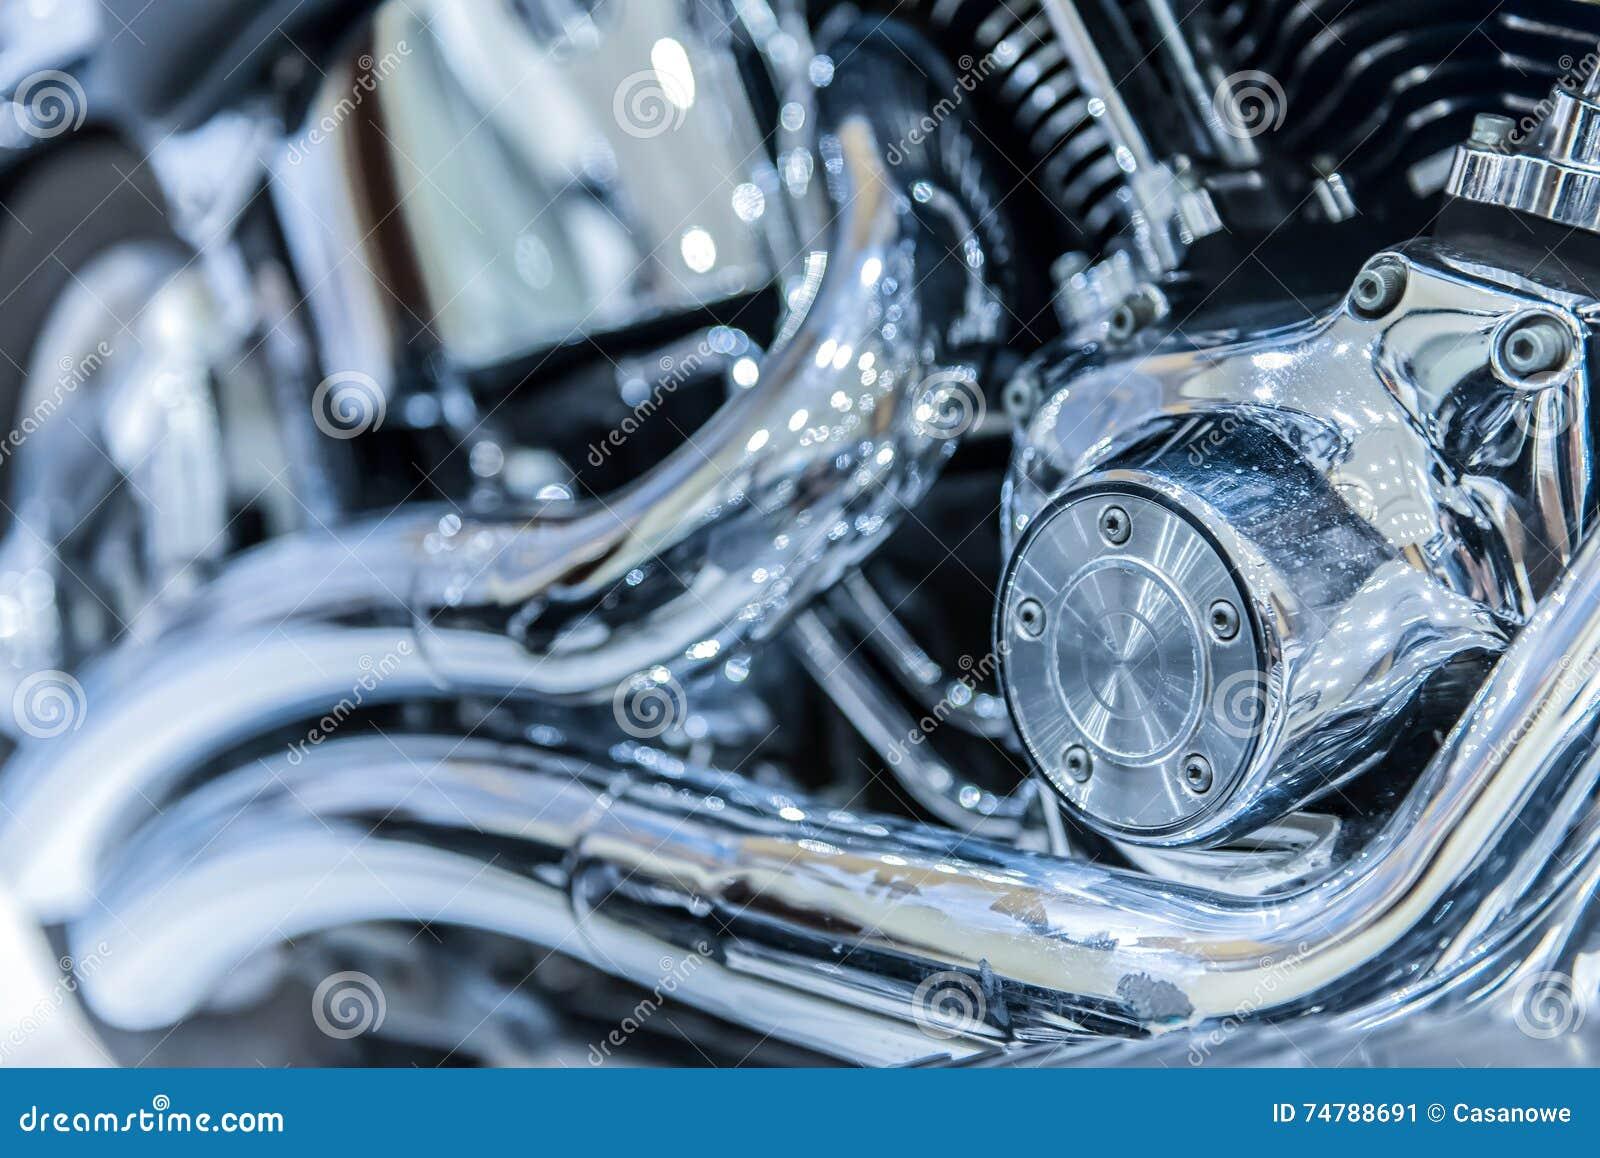 close up car engine royalty free stock image 87971998. Black Bedroom Furniture Sets. Home Design Ideas